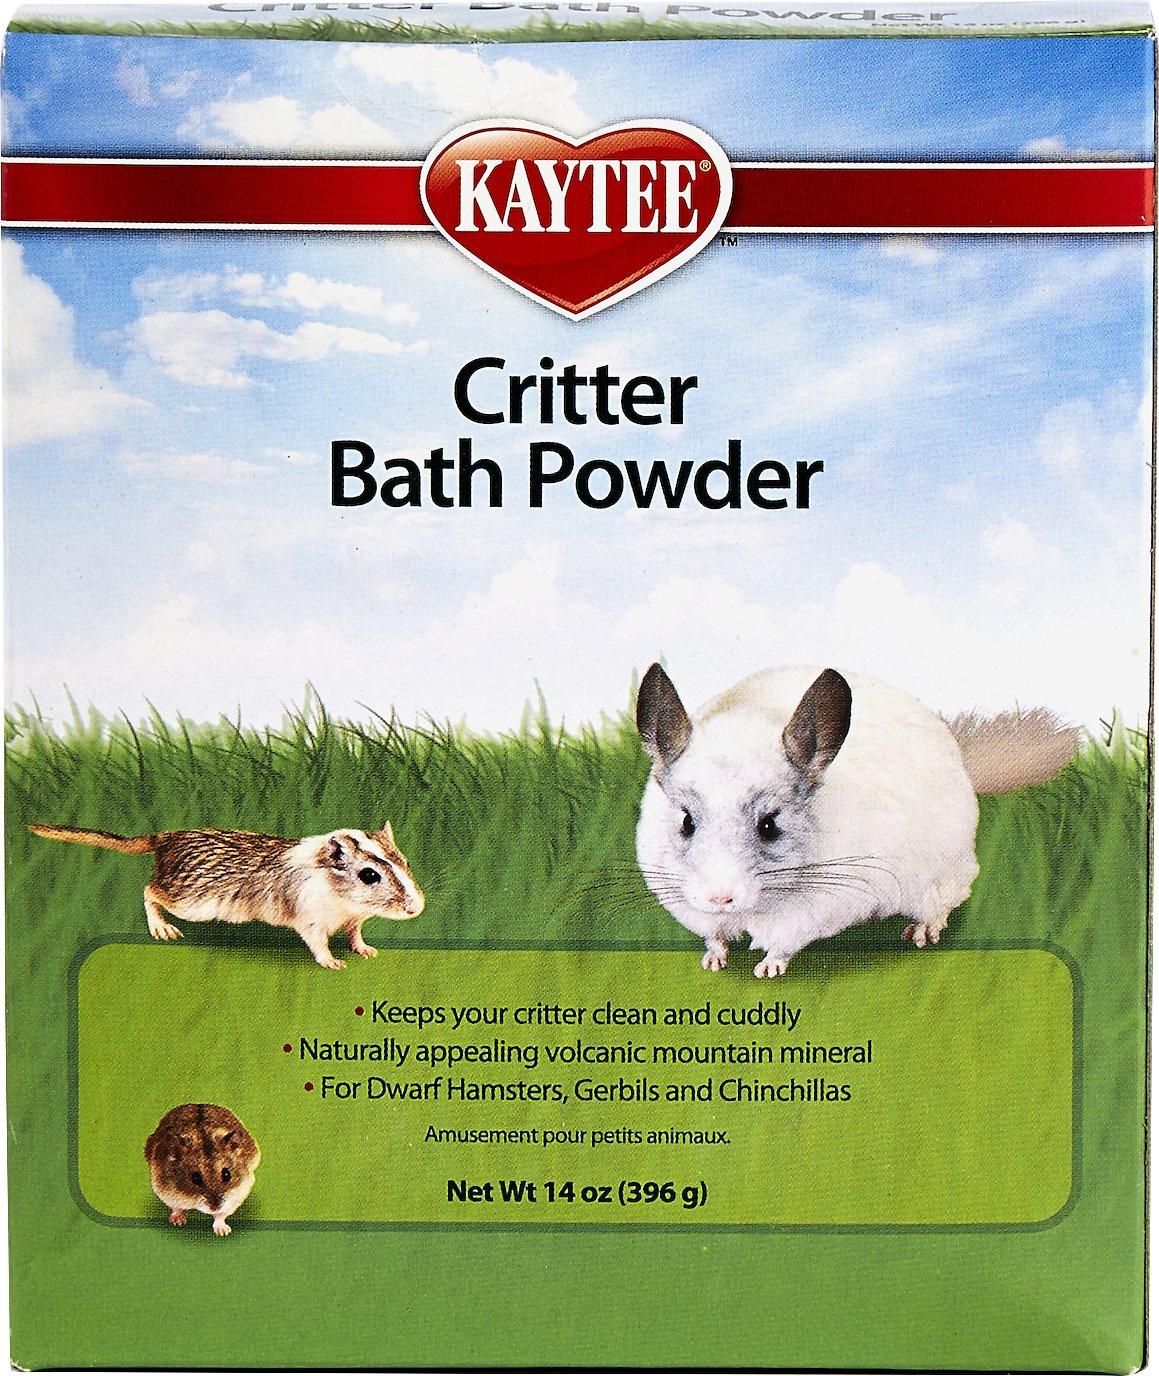 Kaytee Critter Bath Powder for Small Animals, 14-oz box